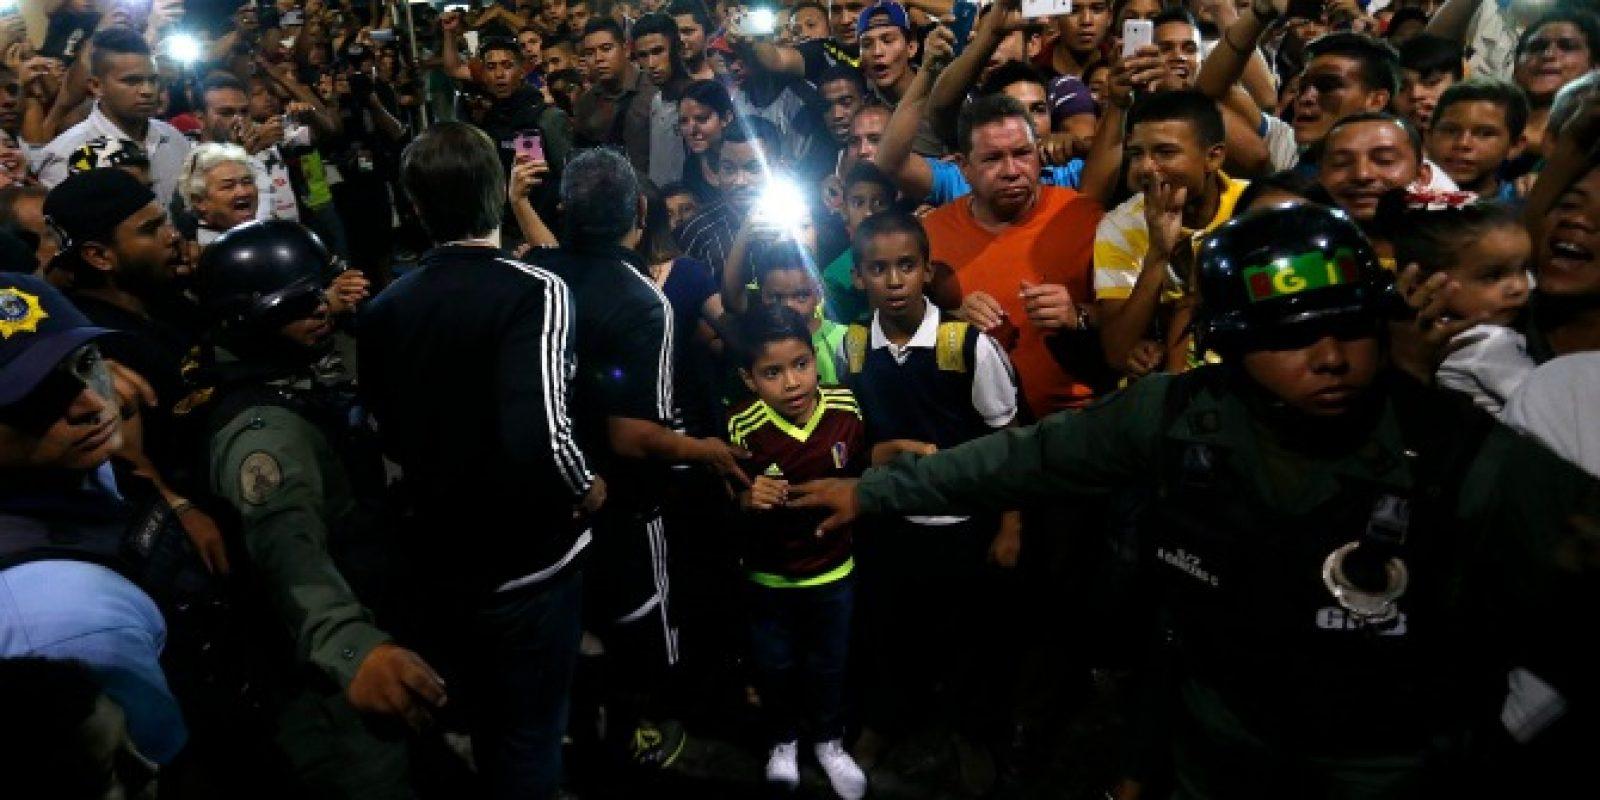 © MARCELO HERNANDEZ/PHOTOSPORT. Imagen Por: